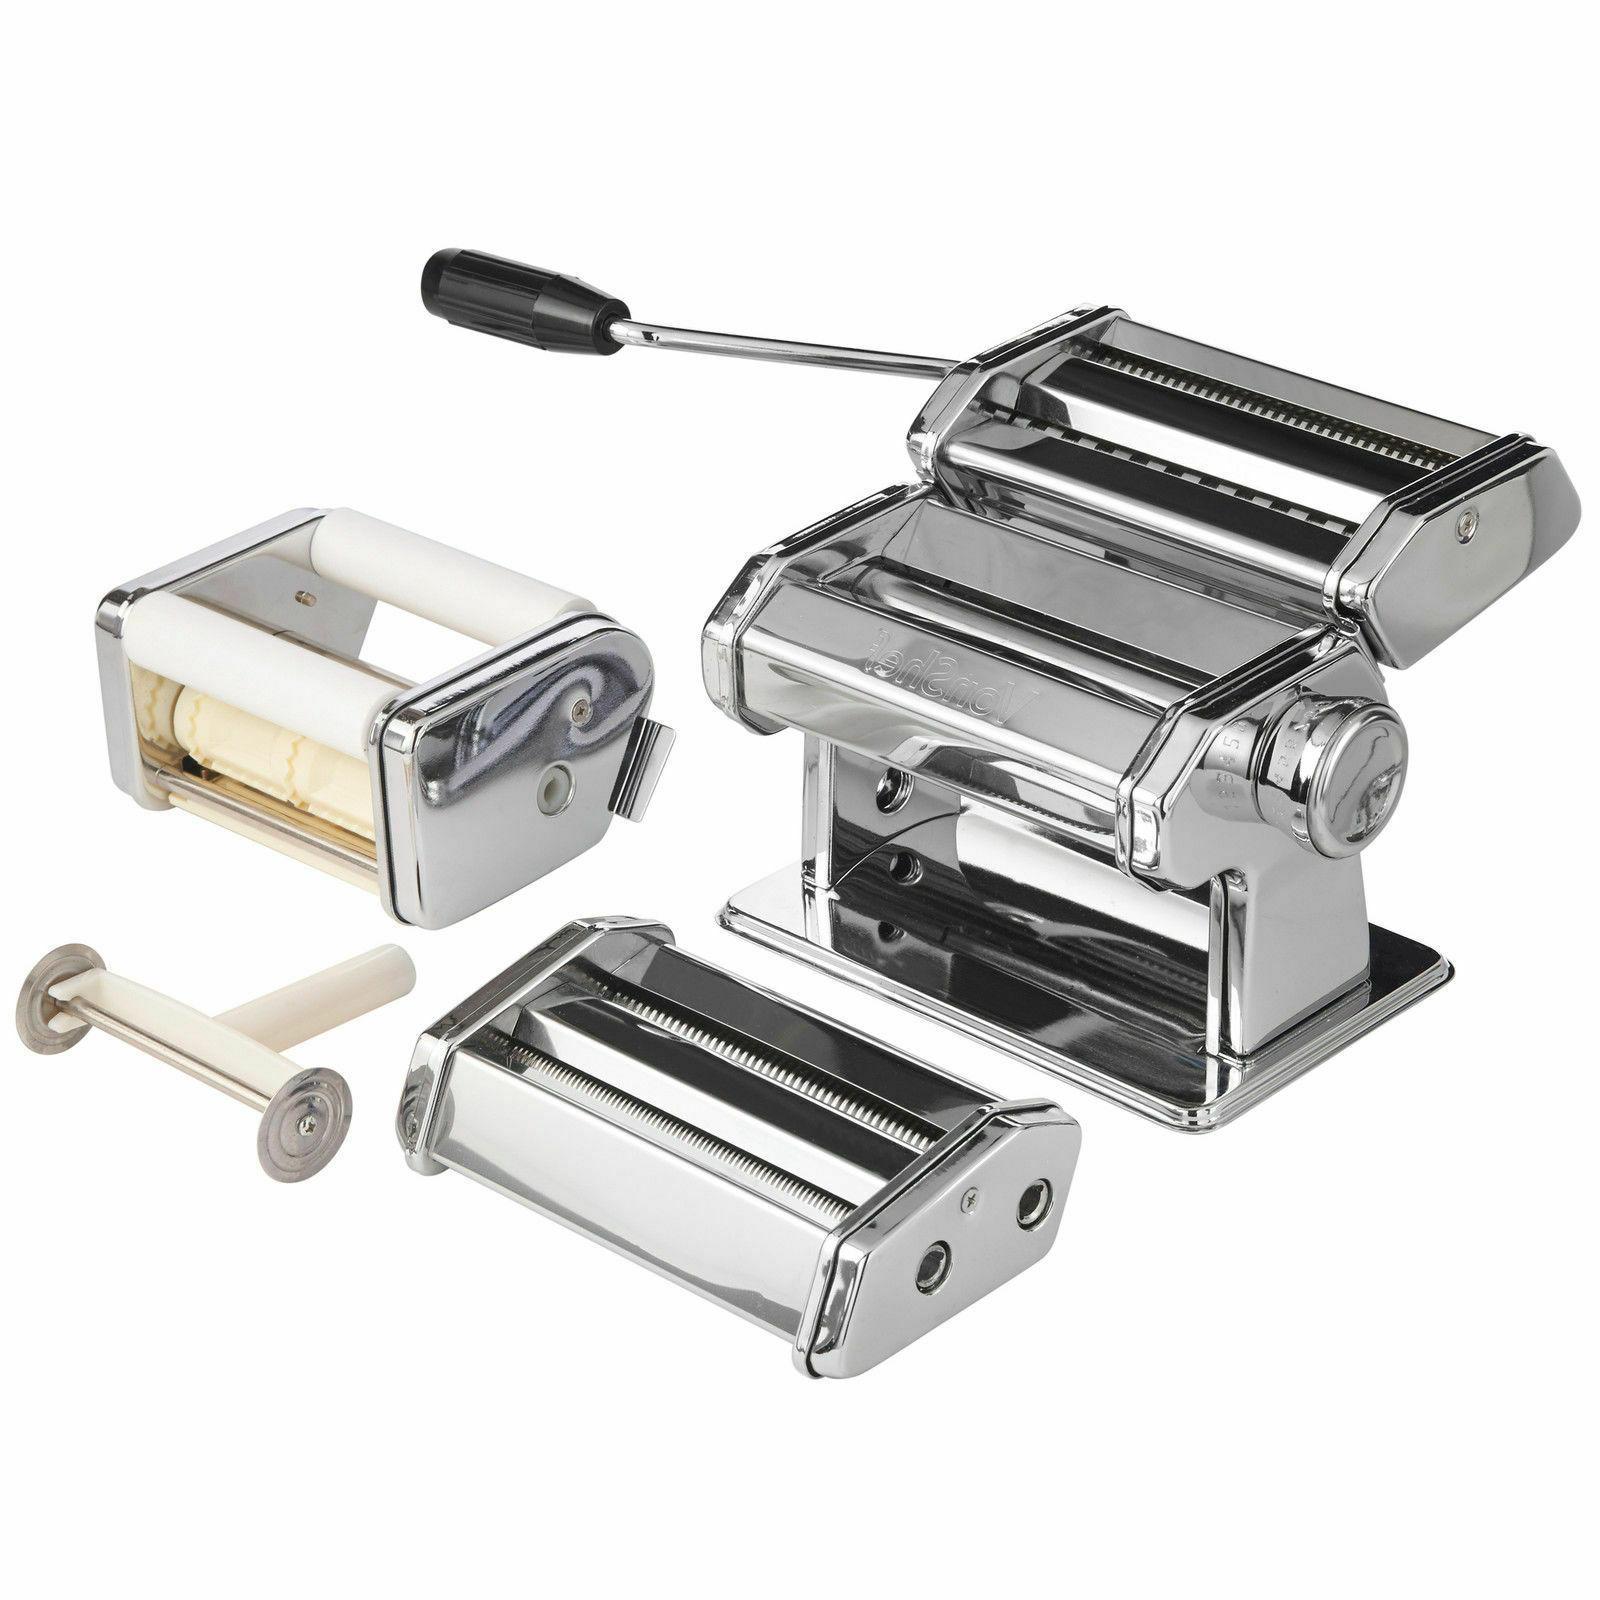 5 1 Pasta Maker Ravioli Tagliatelle Steel